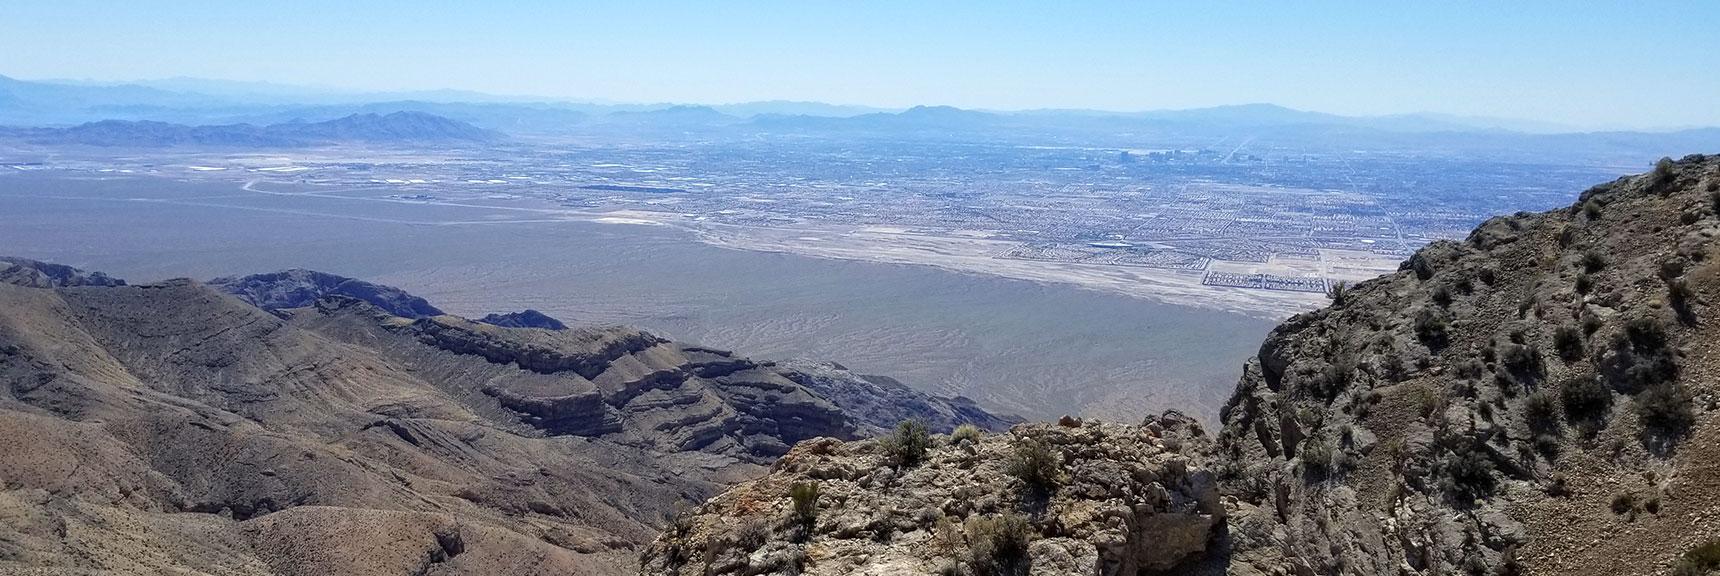 View toward Lake Mead from near Gass Peak East summit, Nevada.